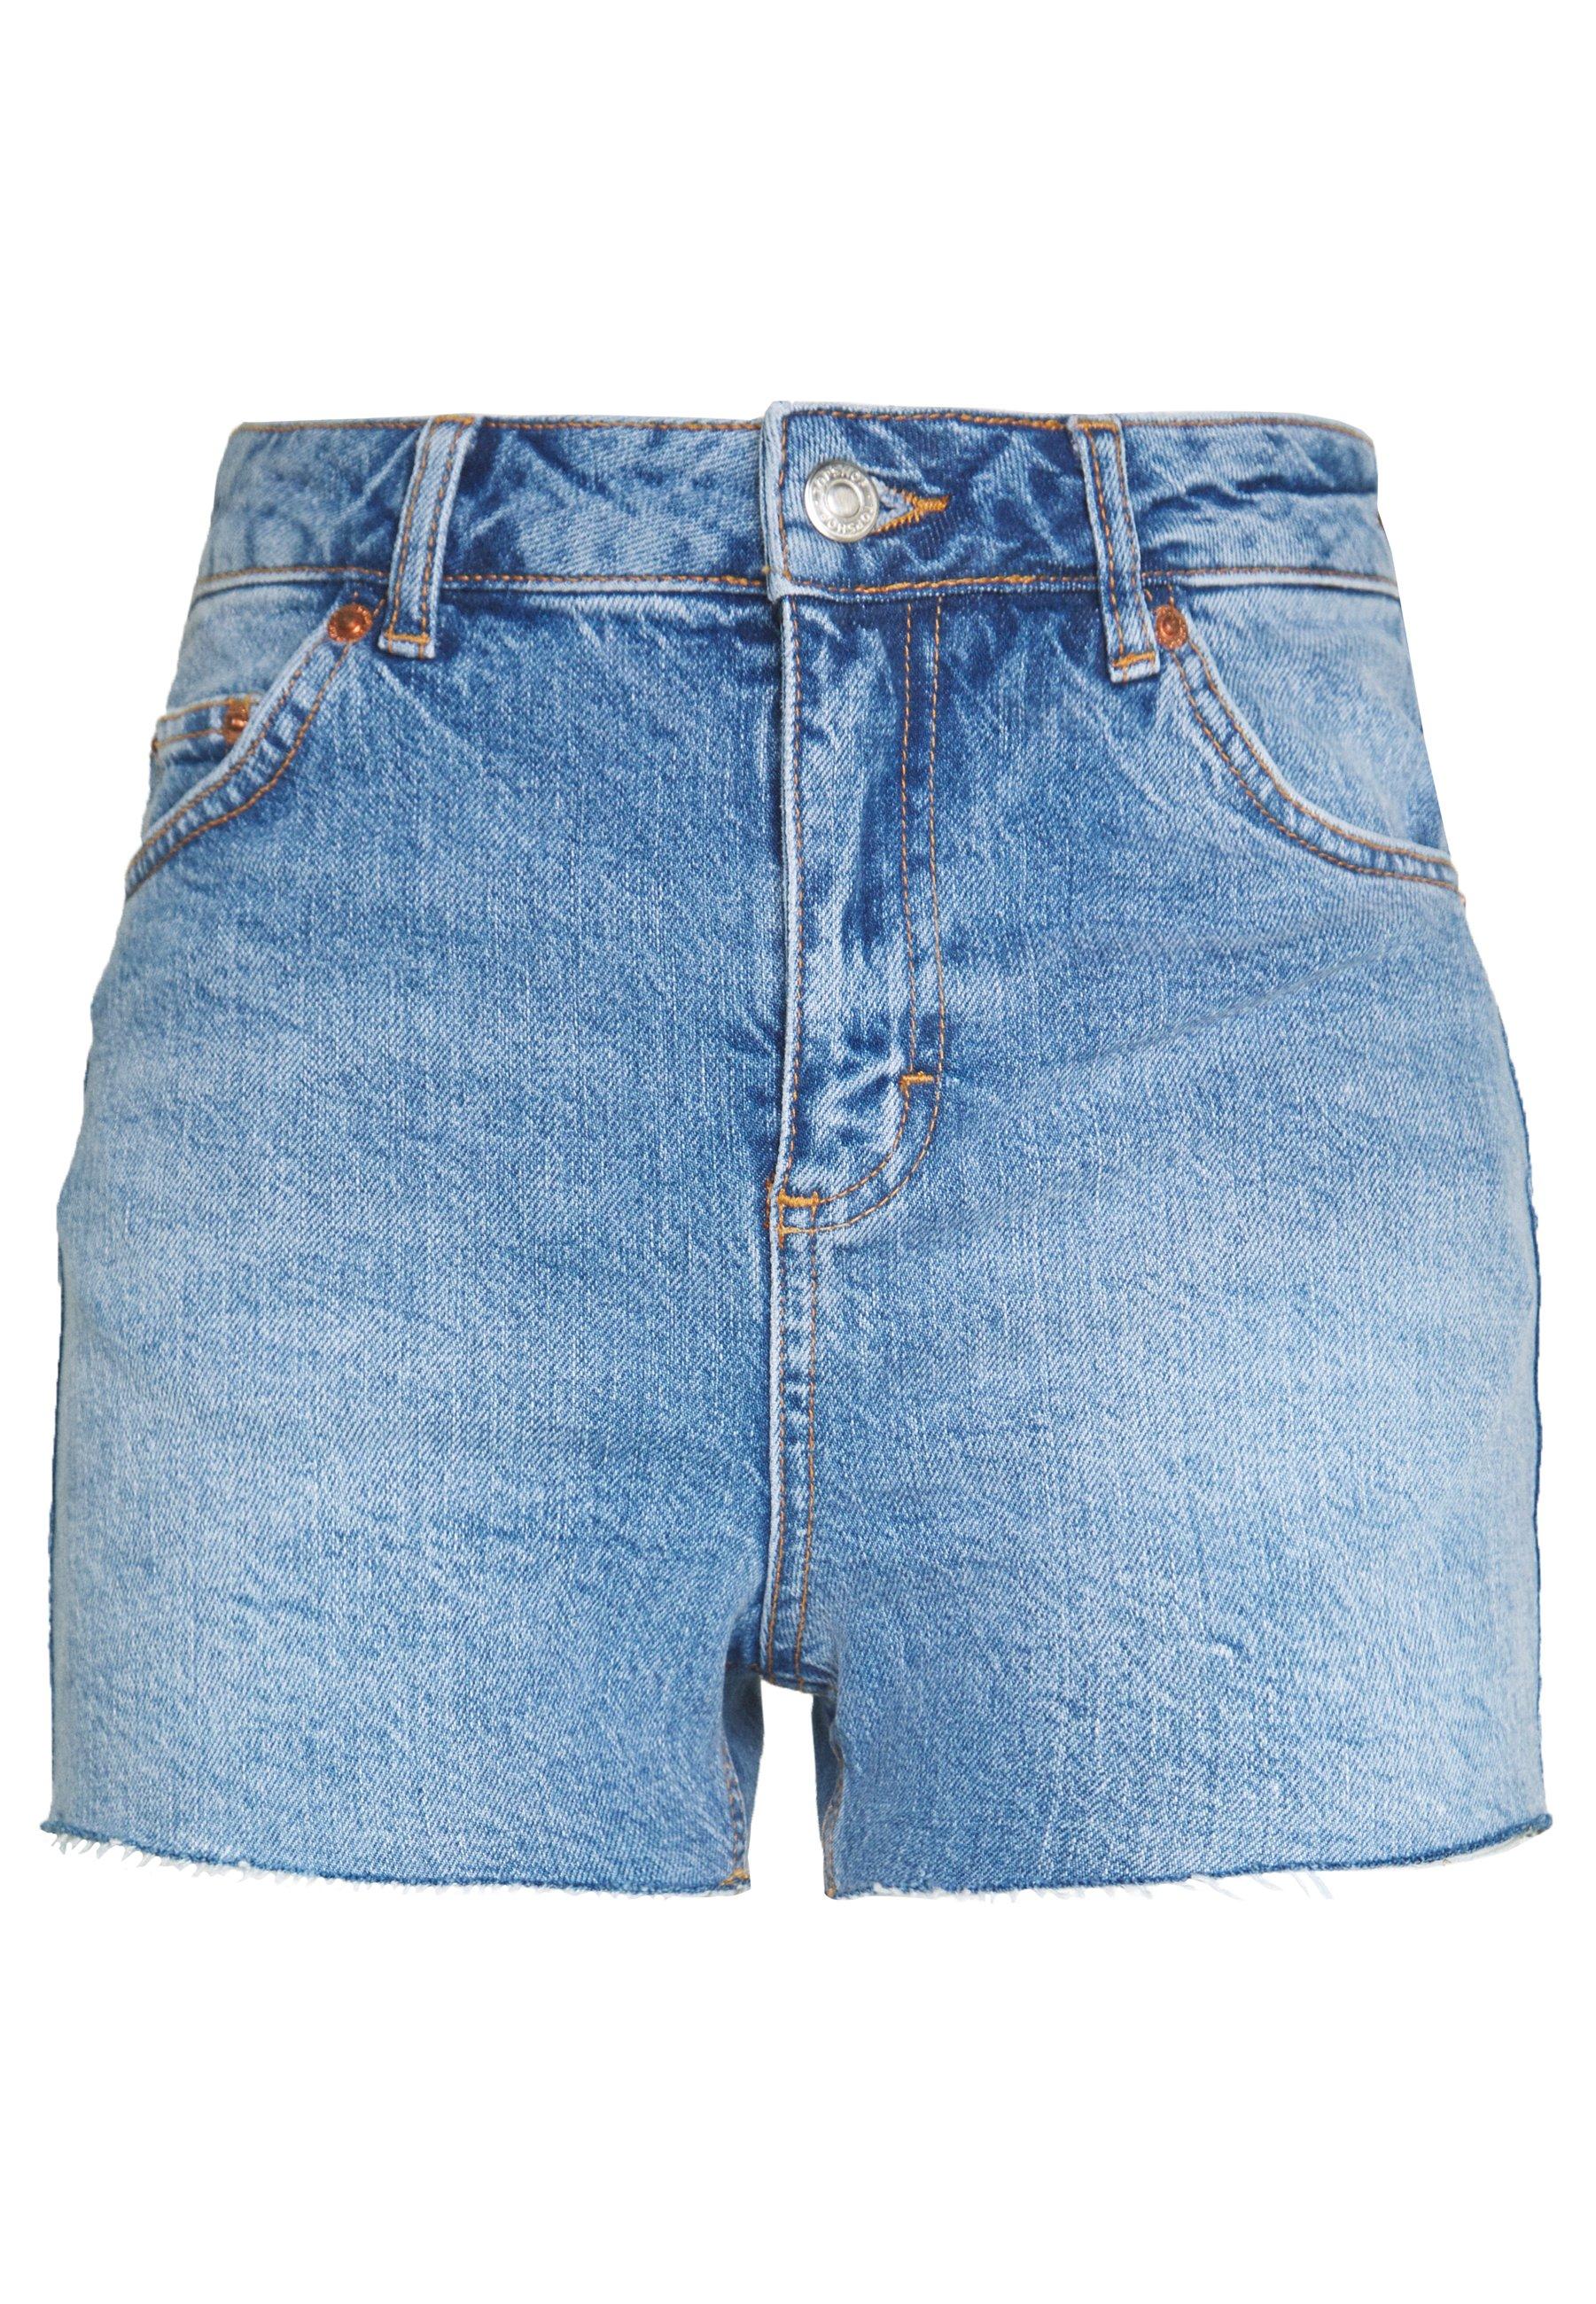 Topshop Szorty jeansowe - blue denim